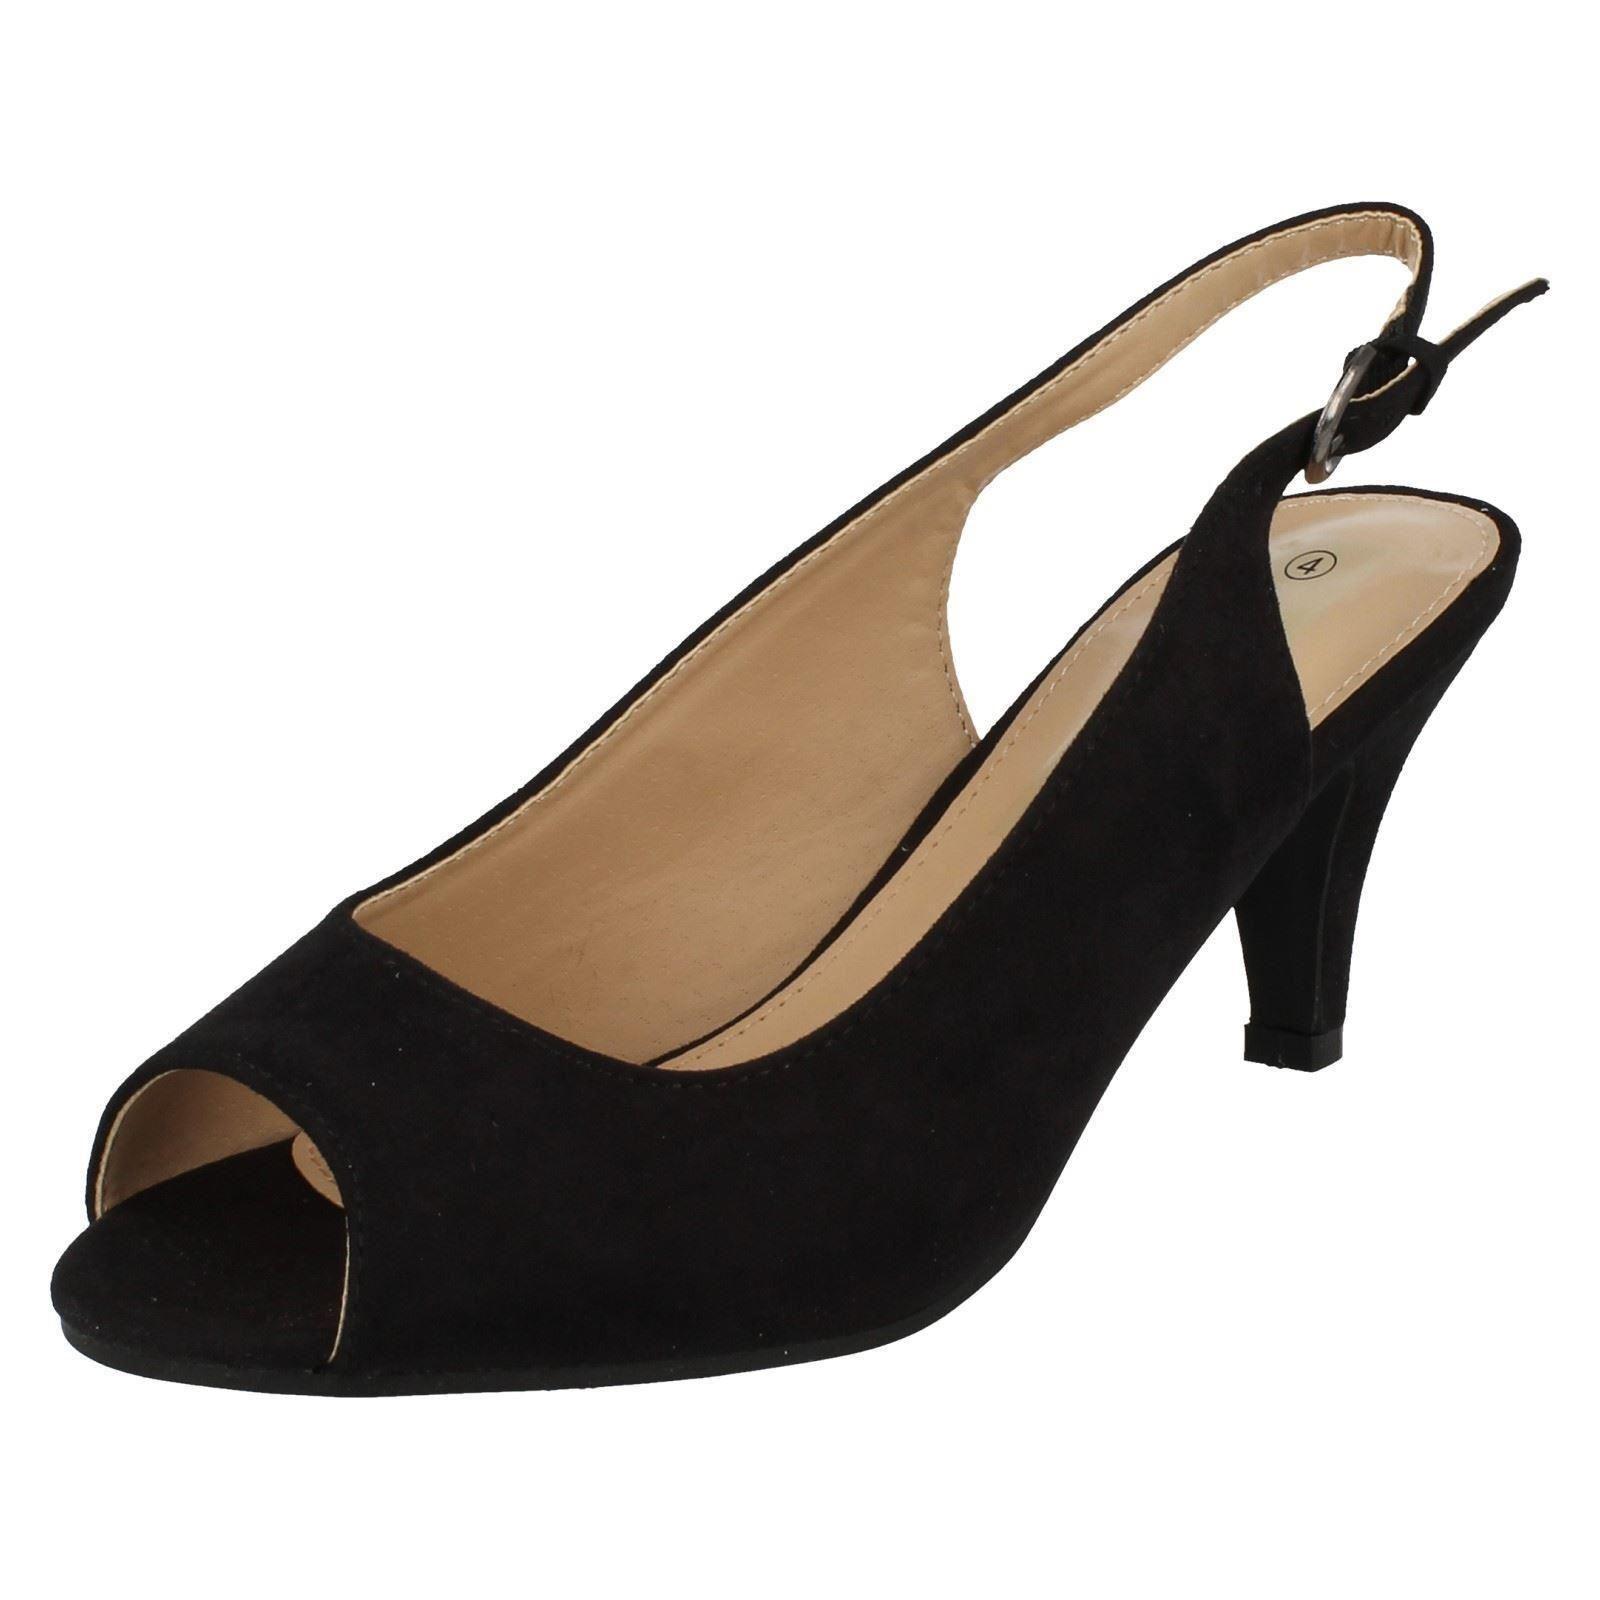 Anne Michelle F1R0593 Ladies Black Sling Back Peep toe Wide Fit shoes (R36B)